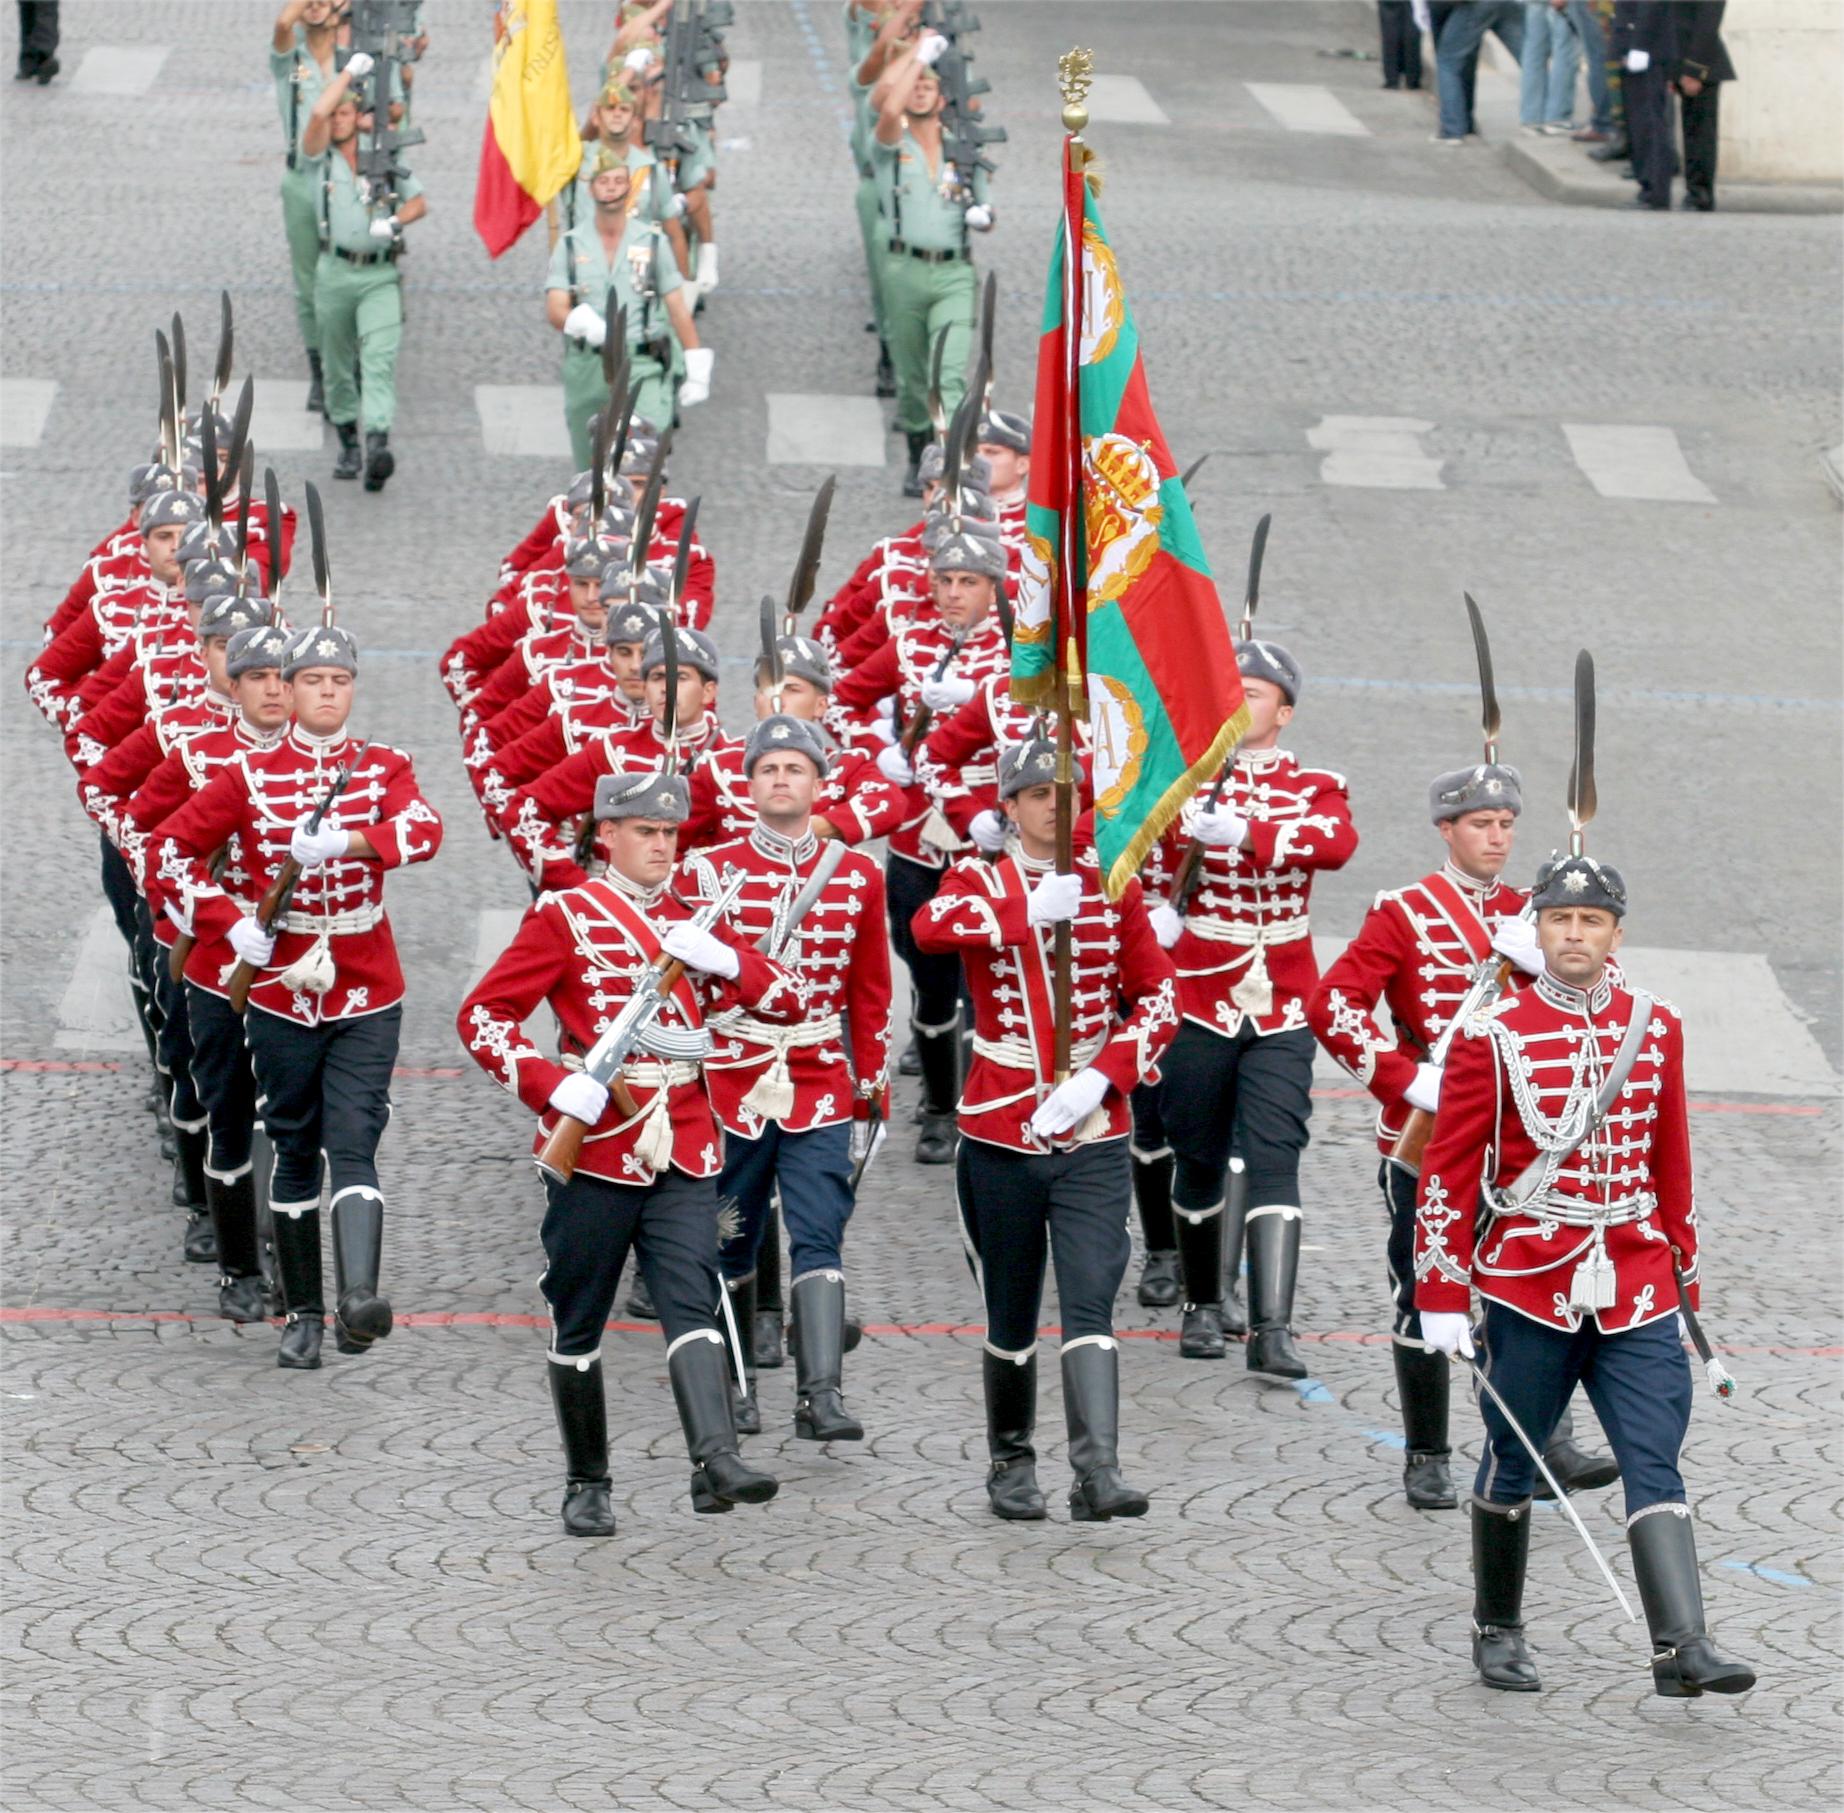 Die bulgarische Nationalgarde auf dem Av. Champs Elysées in Paris